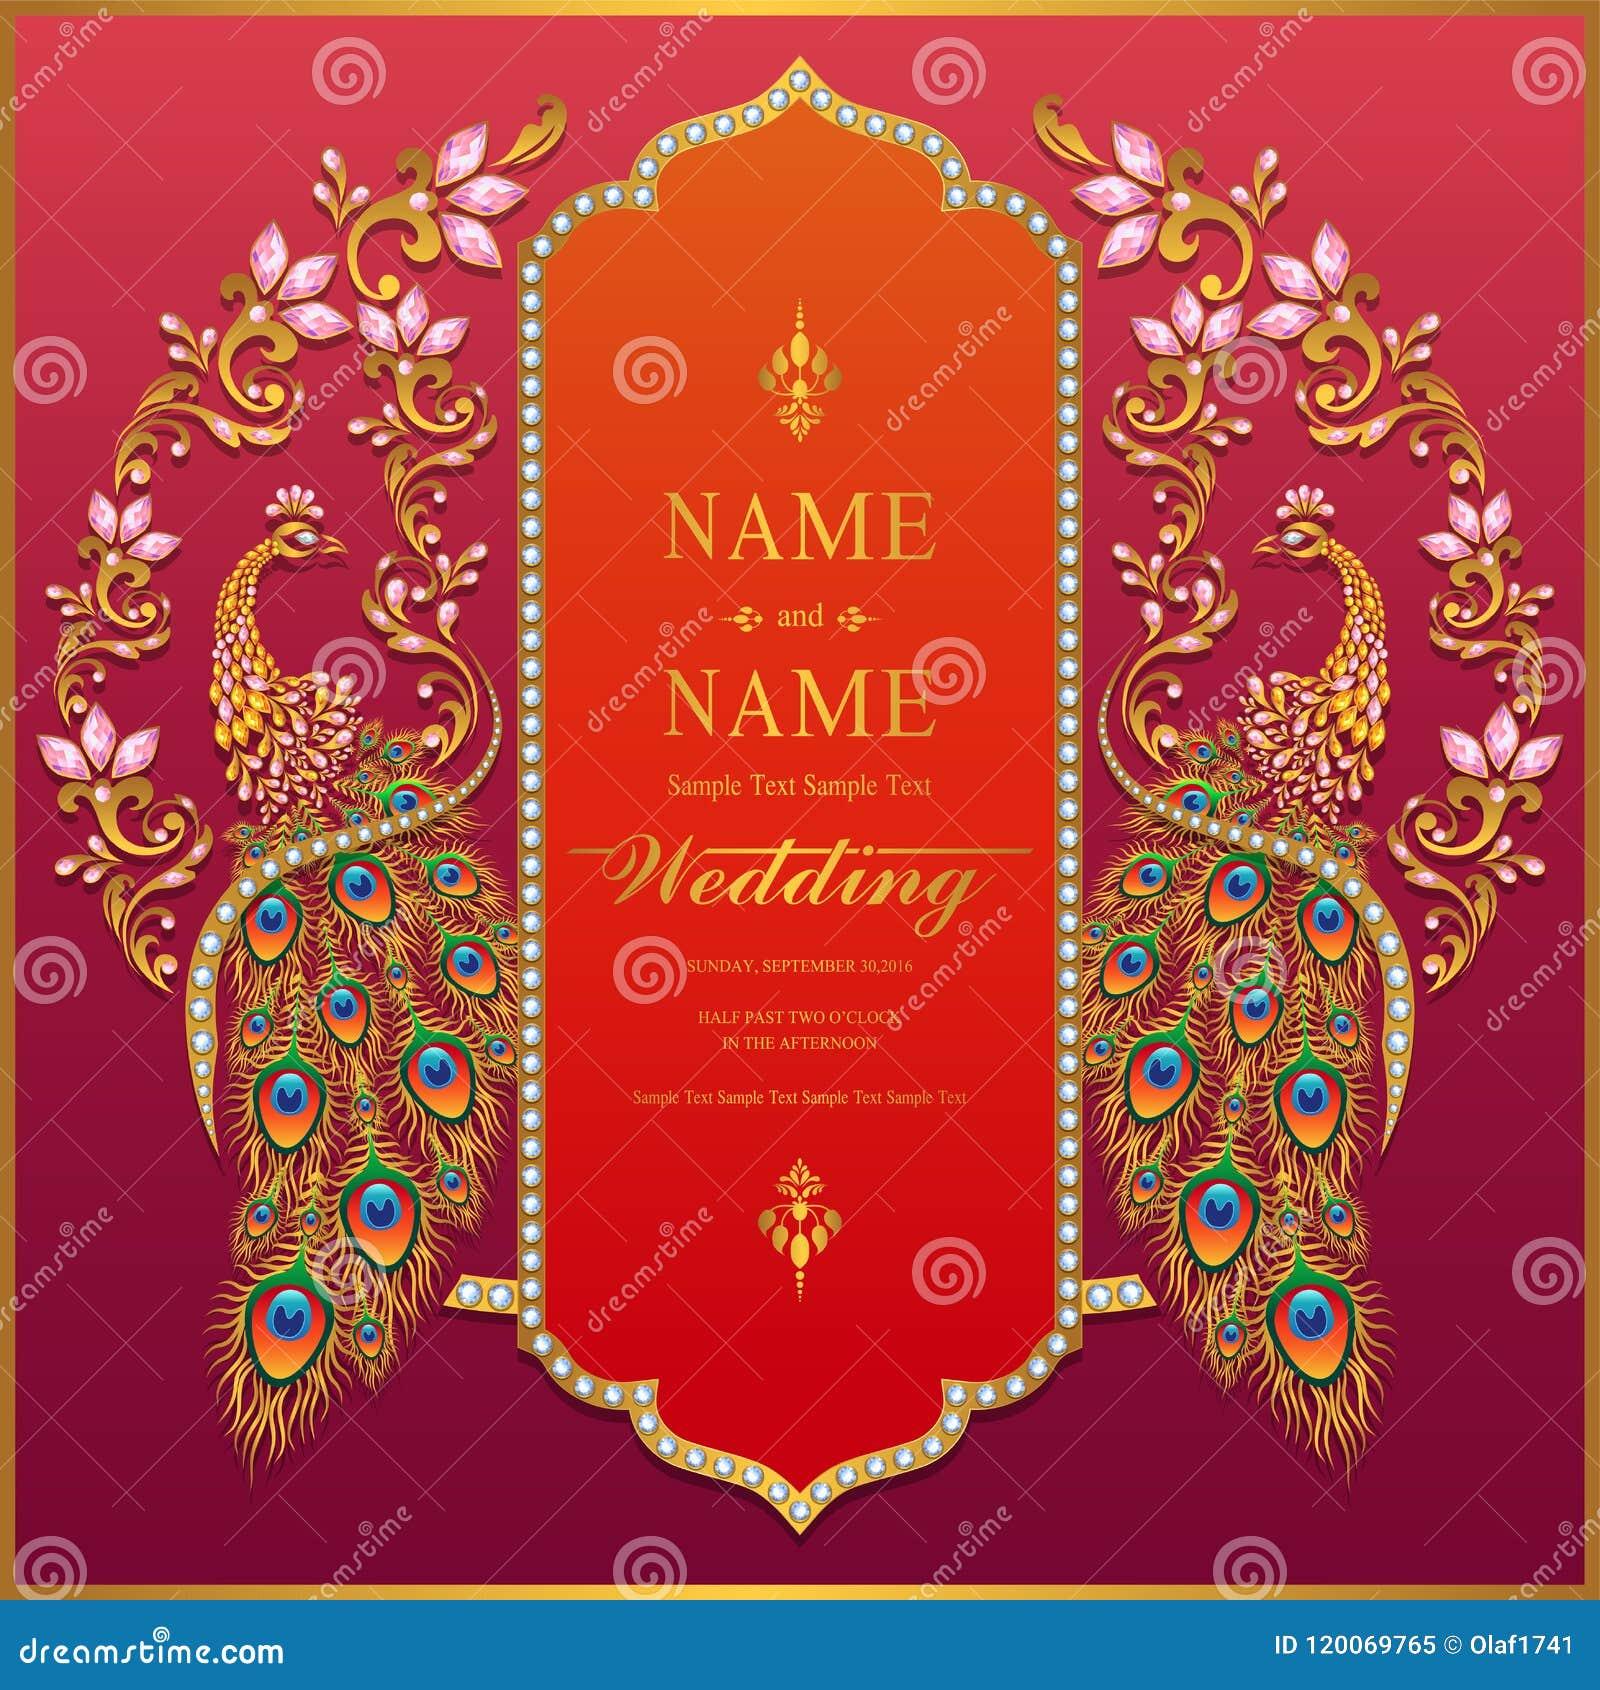 Background Indian Wedding Invitation Card Design